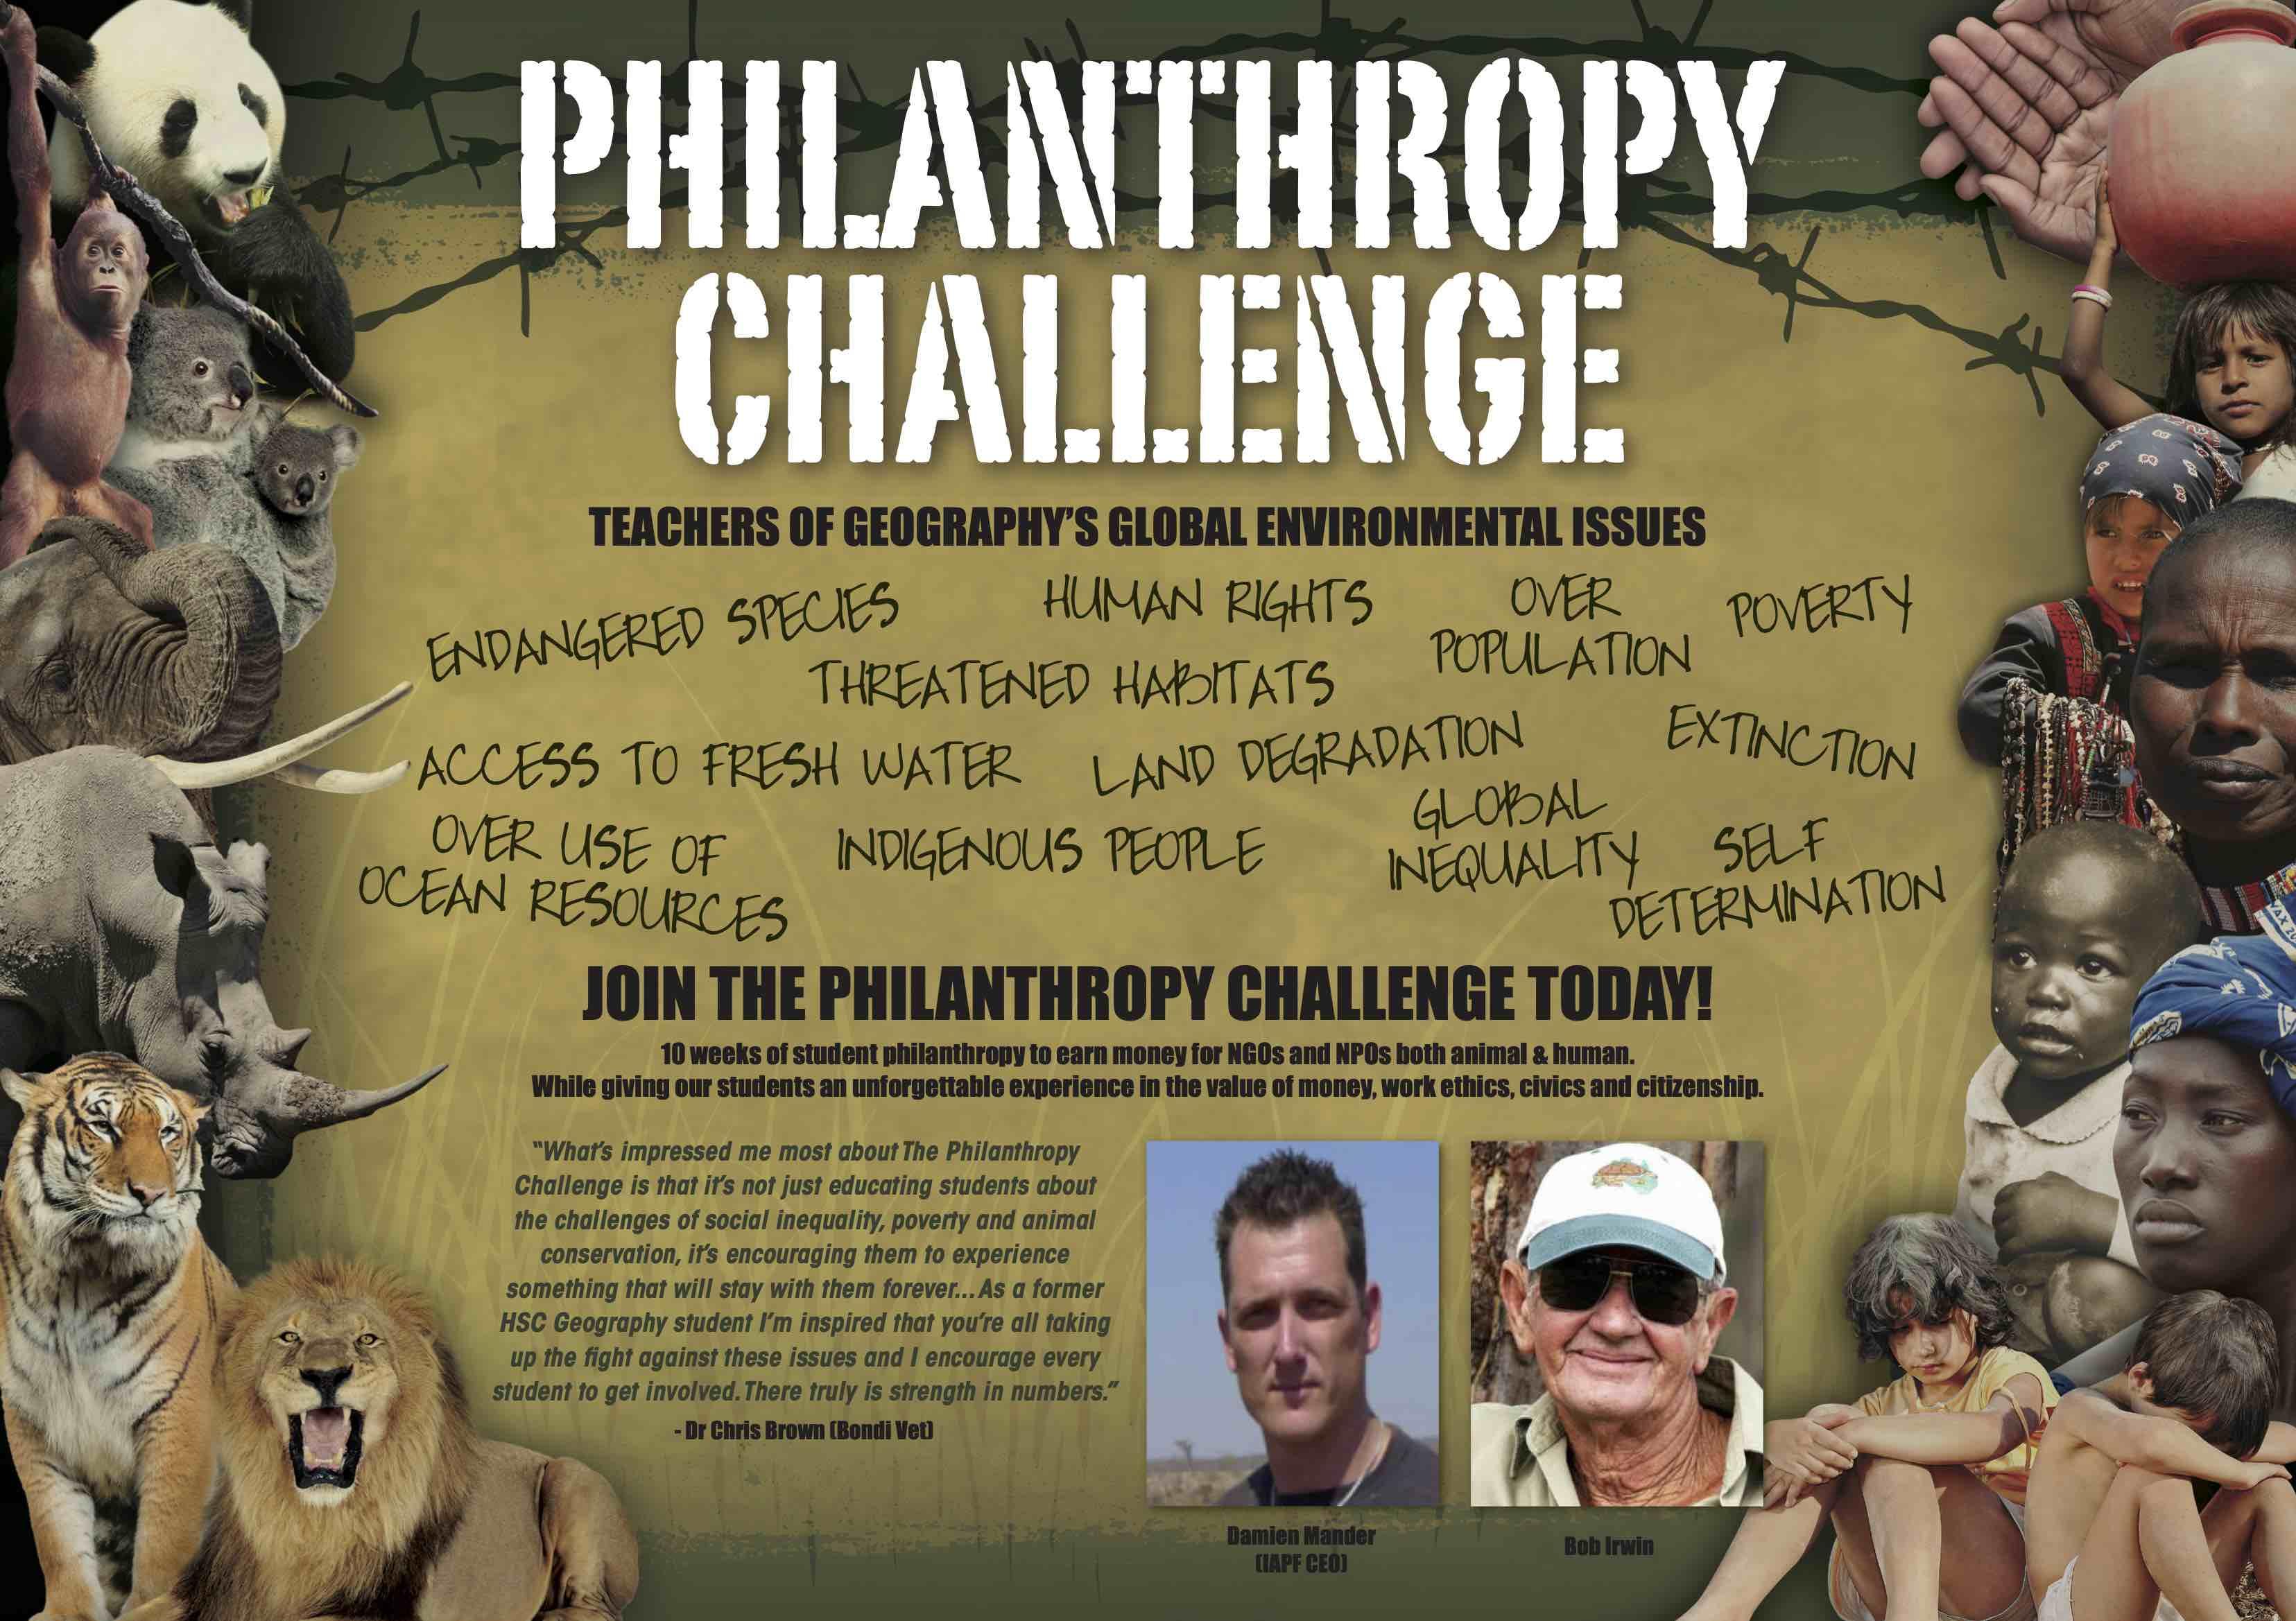 Philanthropy Challenge Poster with Bob Irwin